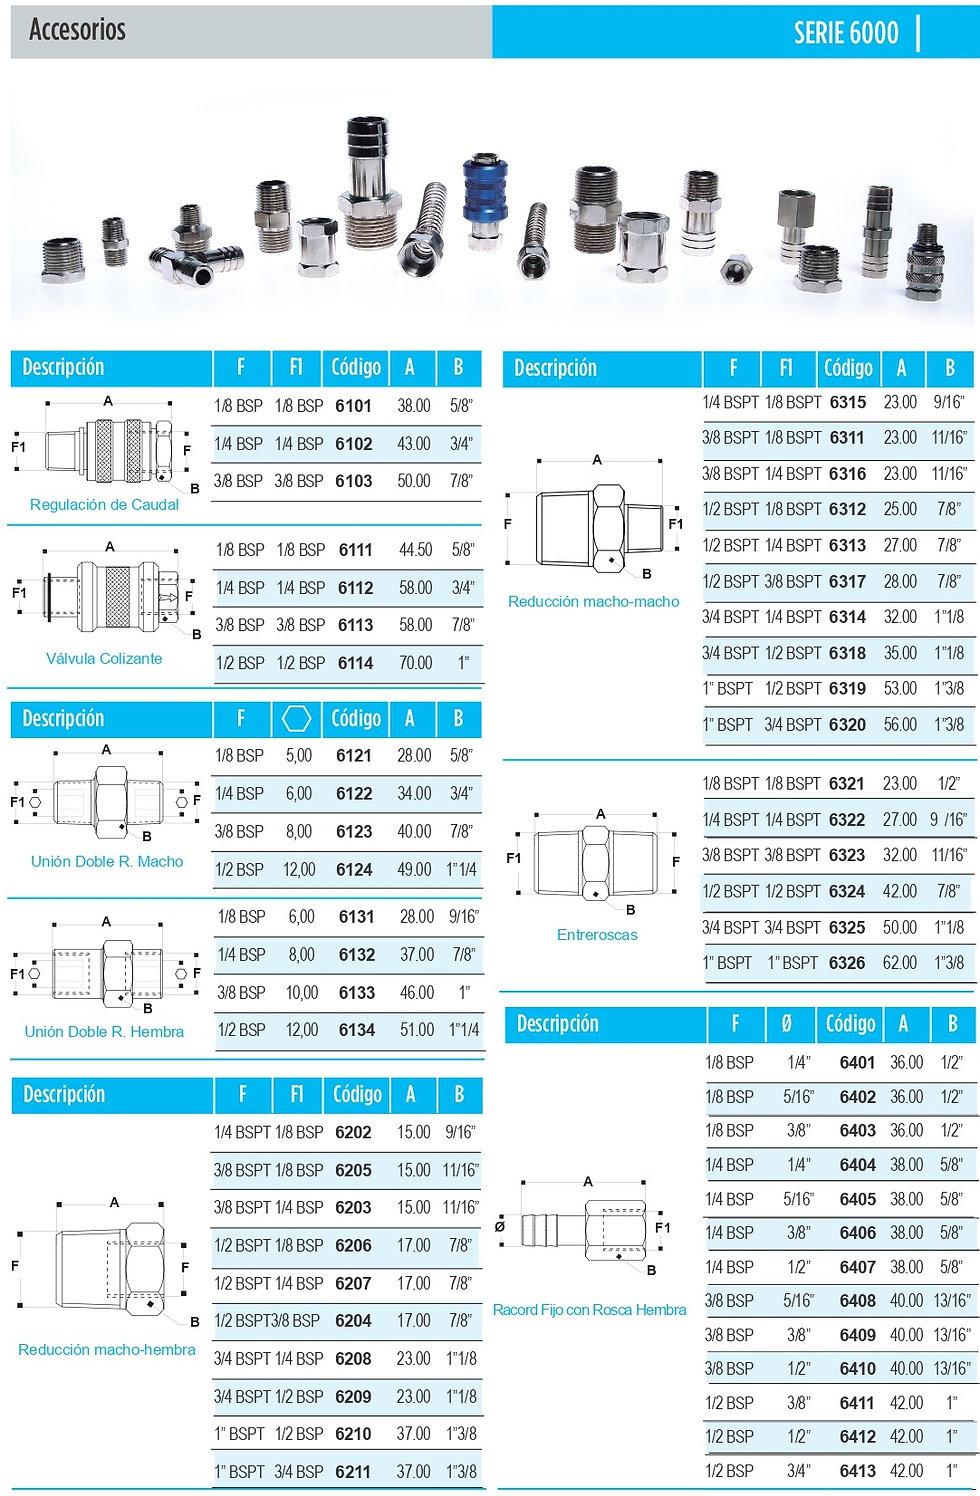 11- PAG SERIE 6000 - 3.jpg